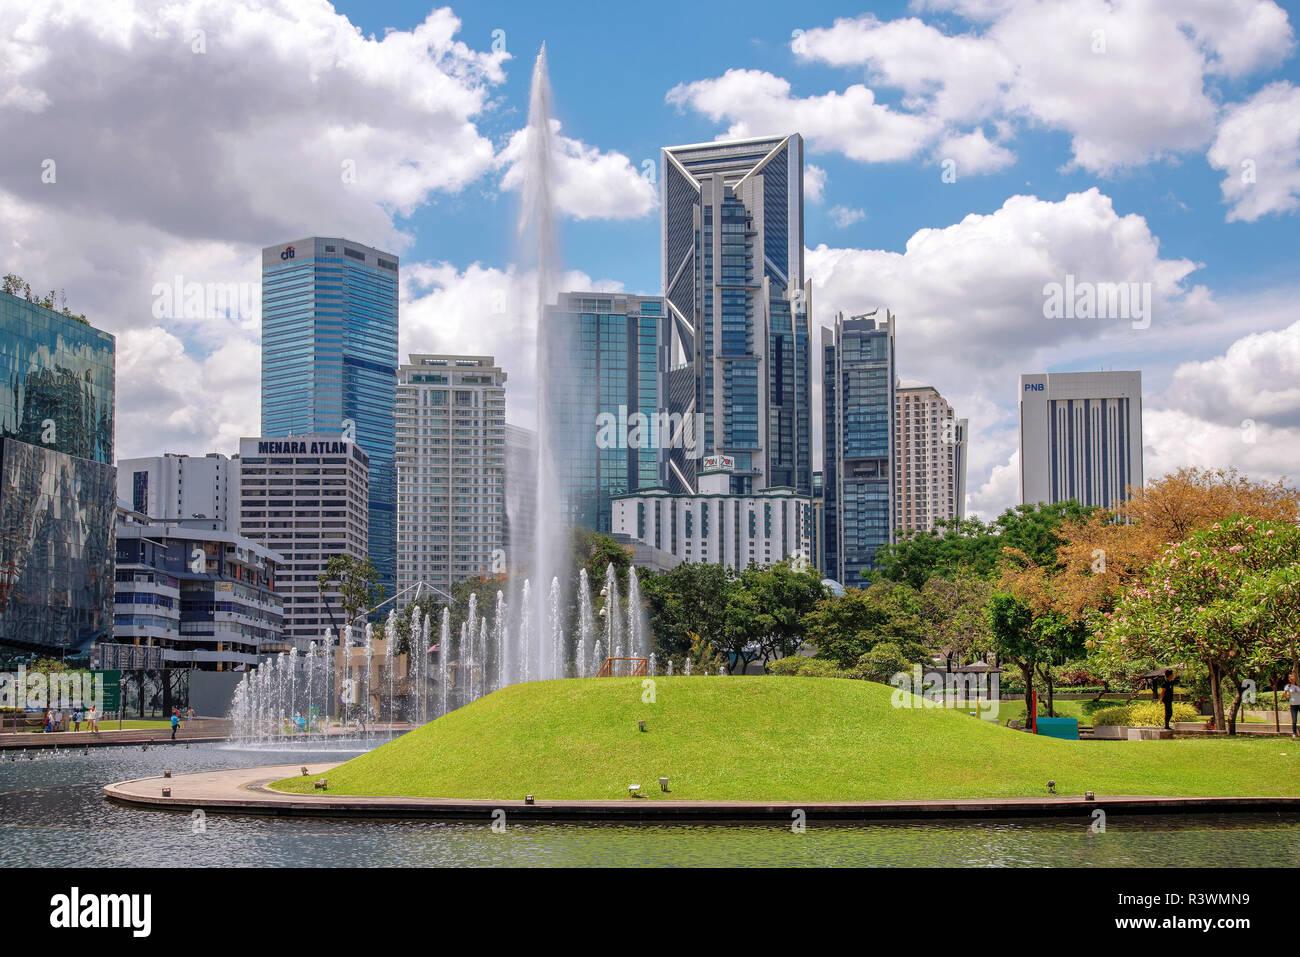 Malaysia City Skyline With Famous Buildings Stock Photos